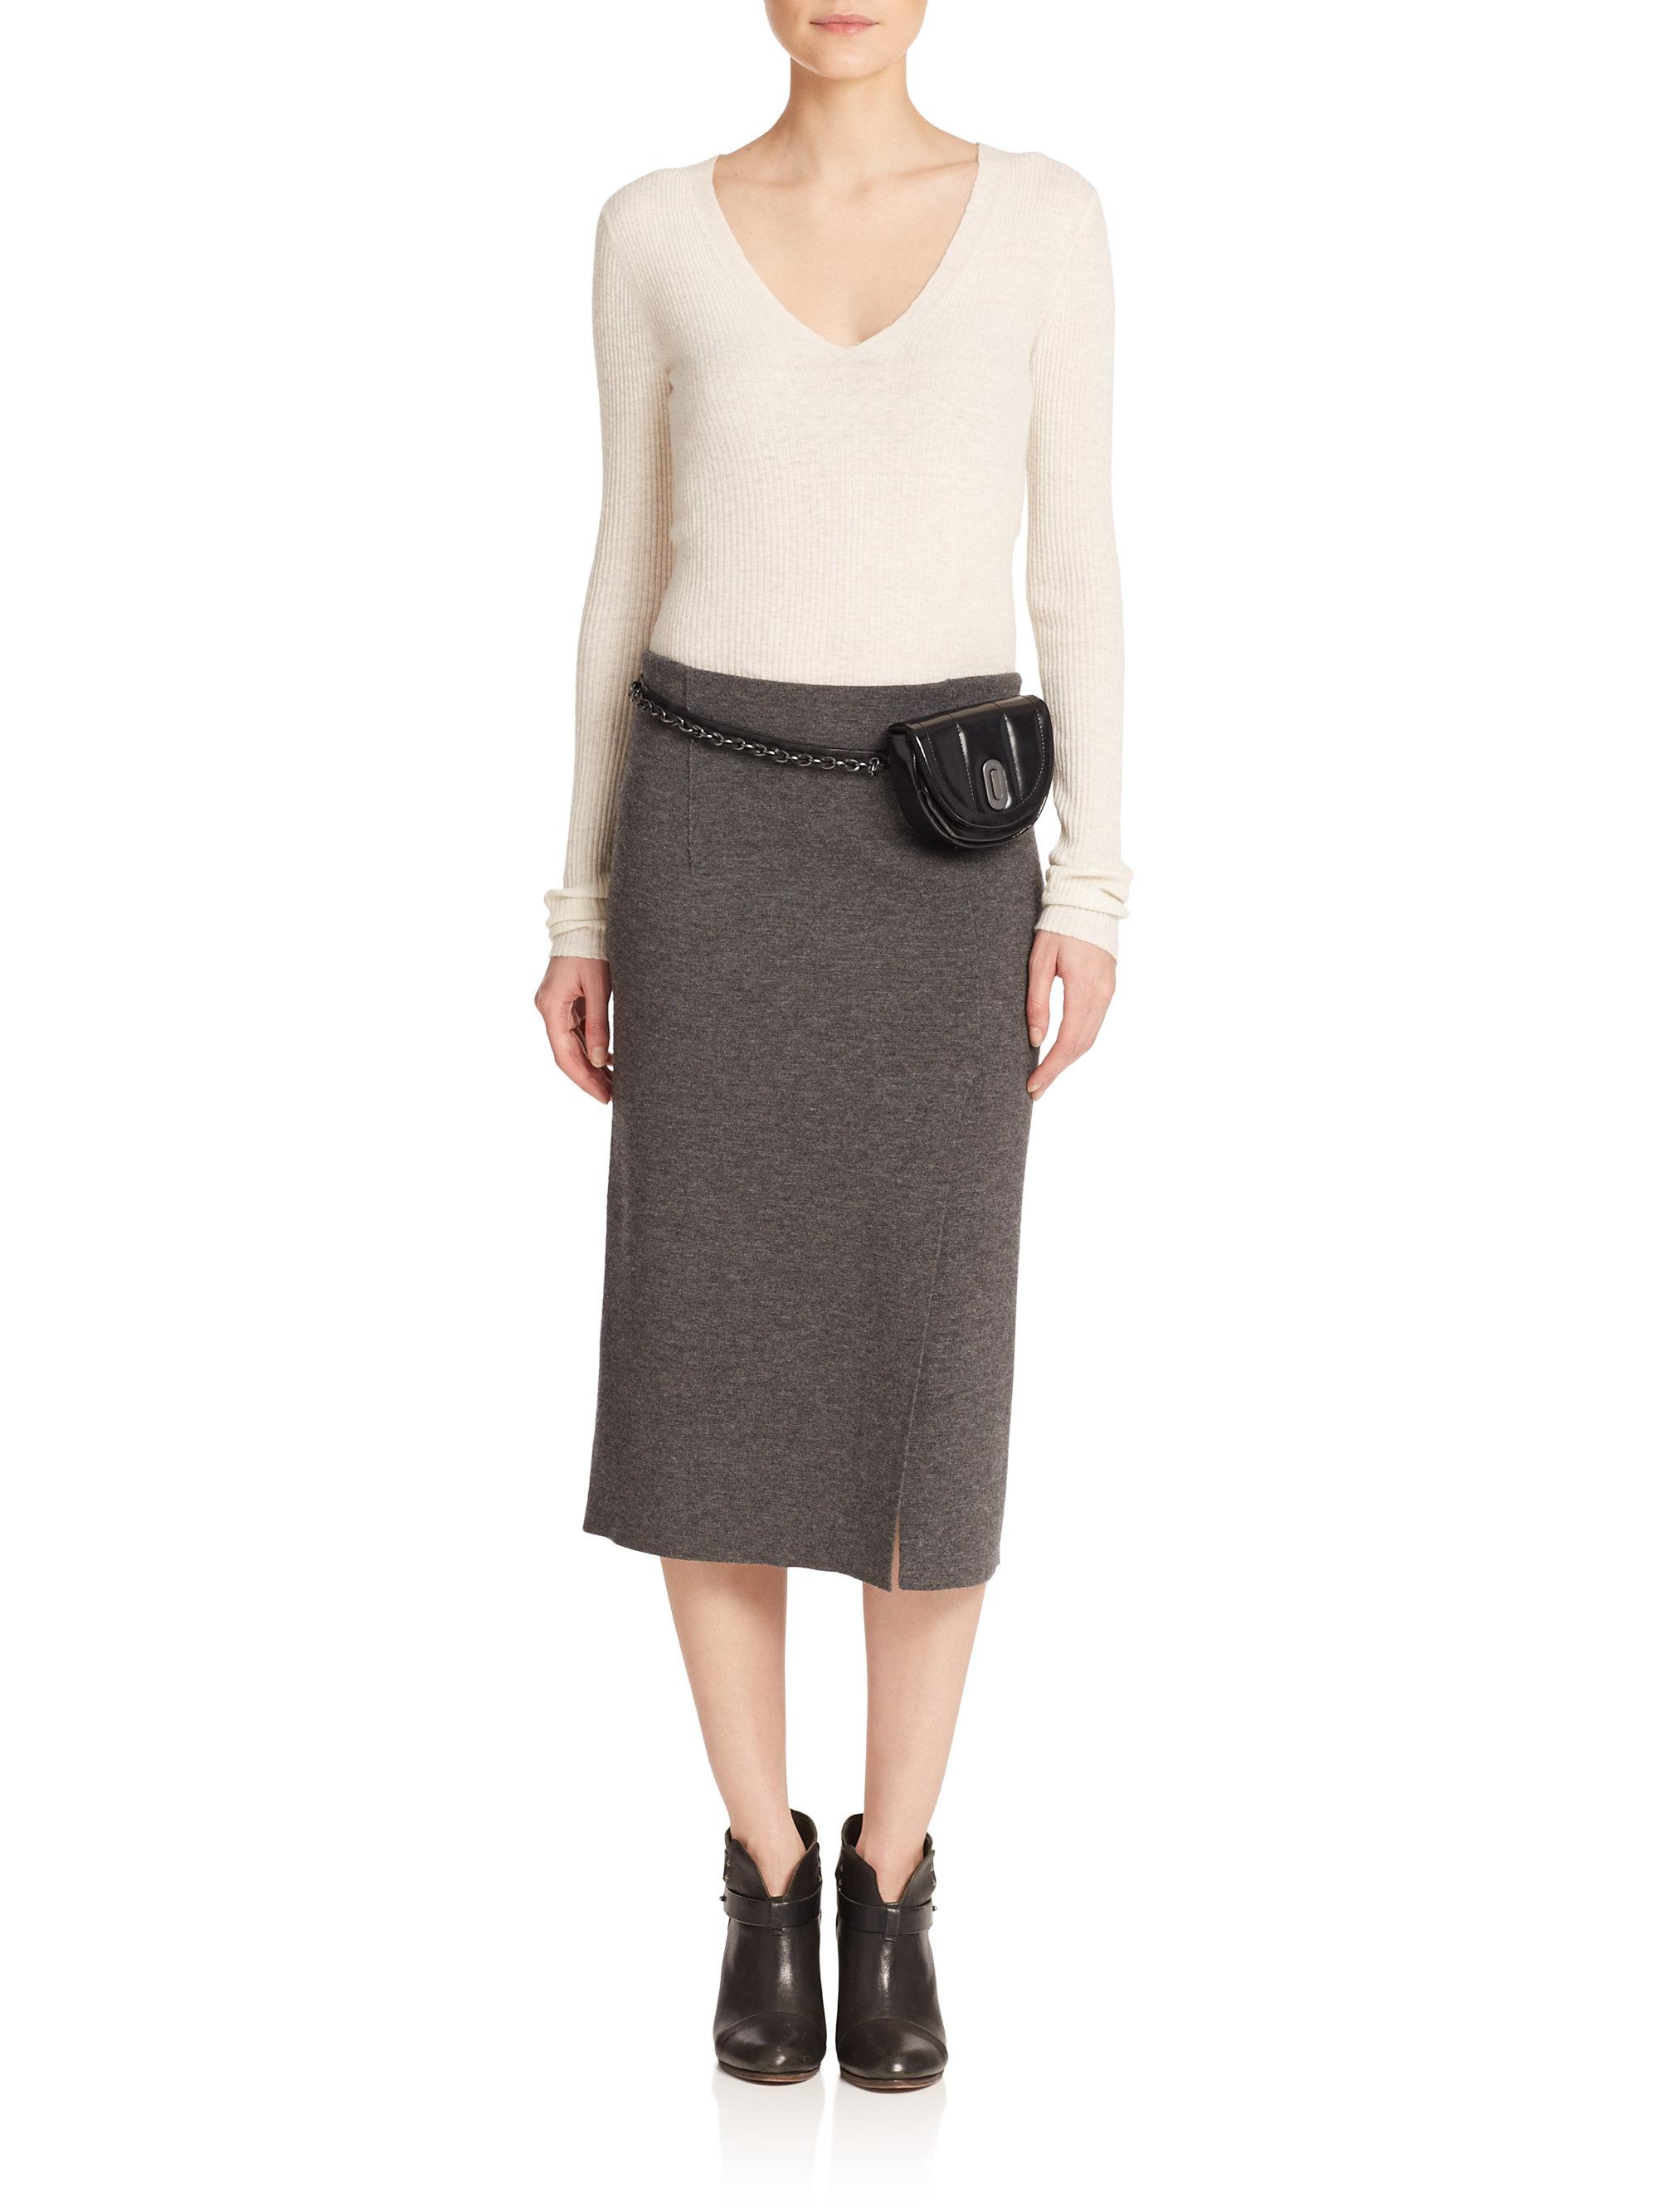 Rag & bone Alanna Merino Wool Midi Skirt in Gray | Lyst